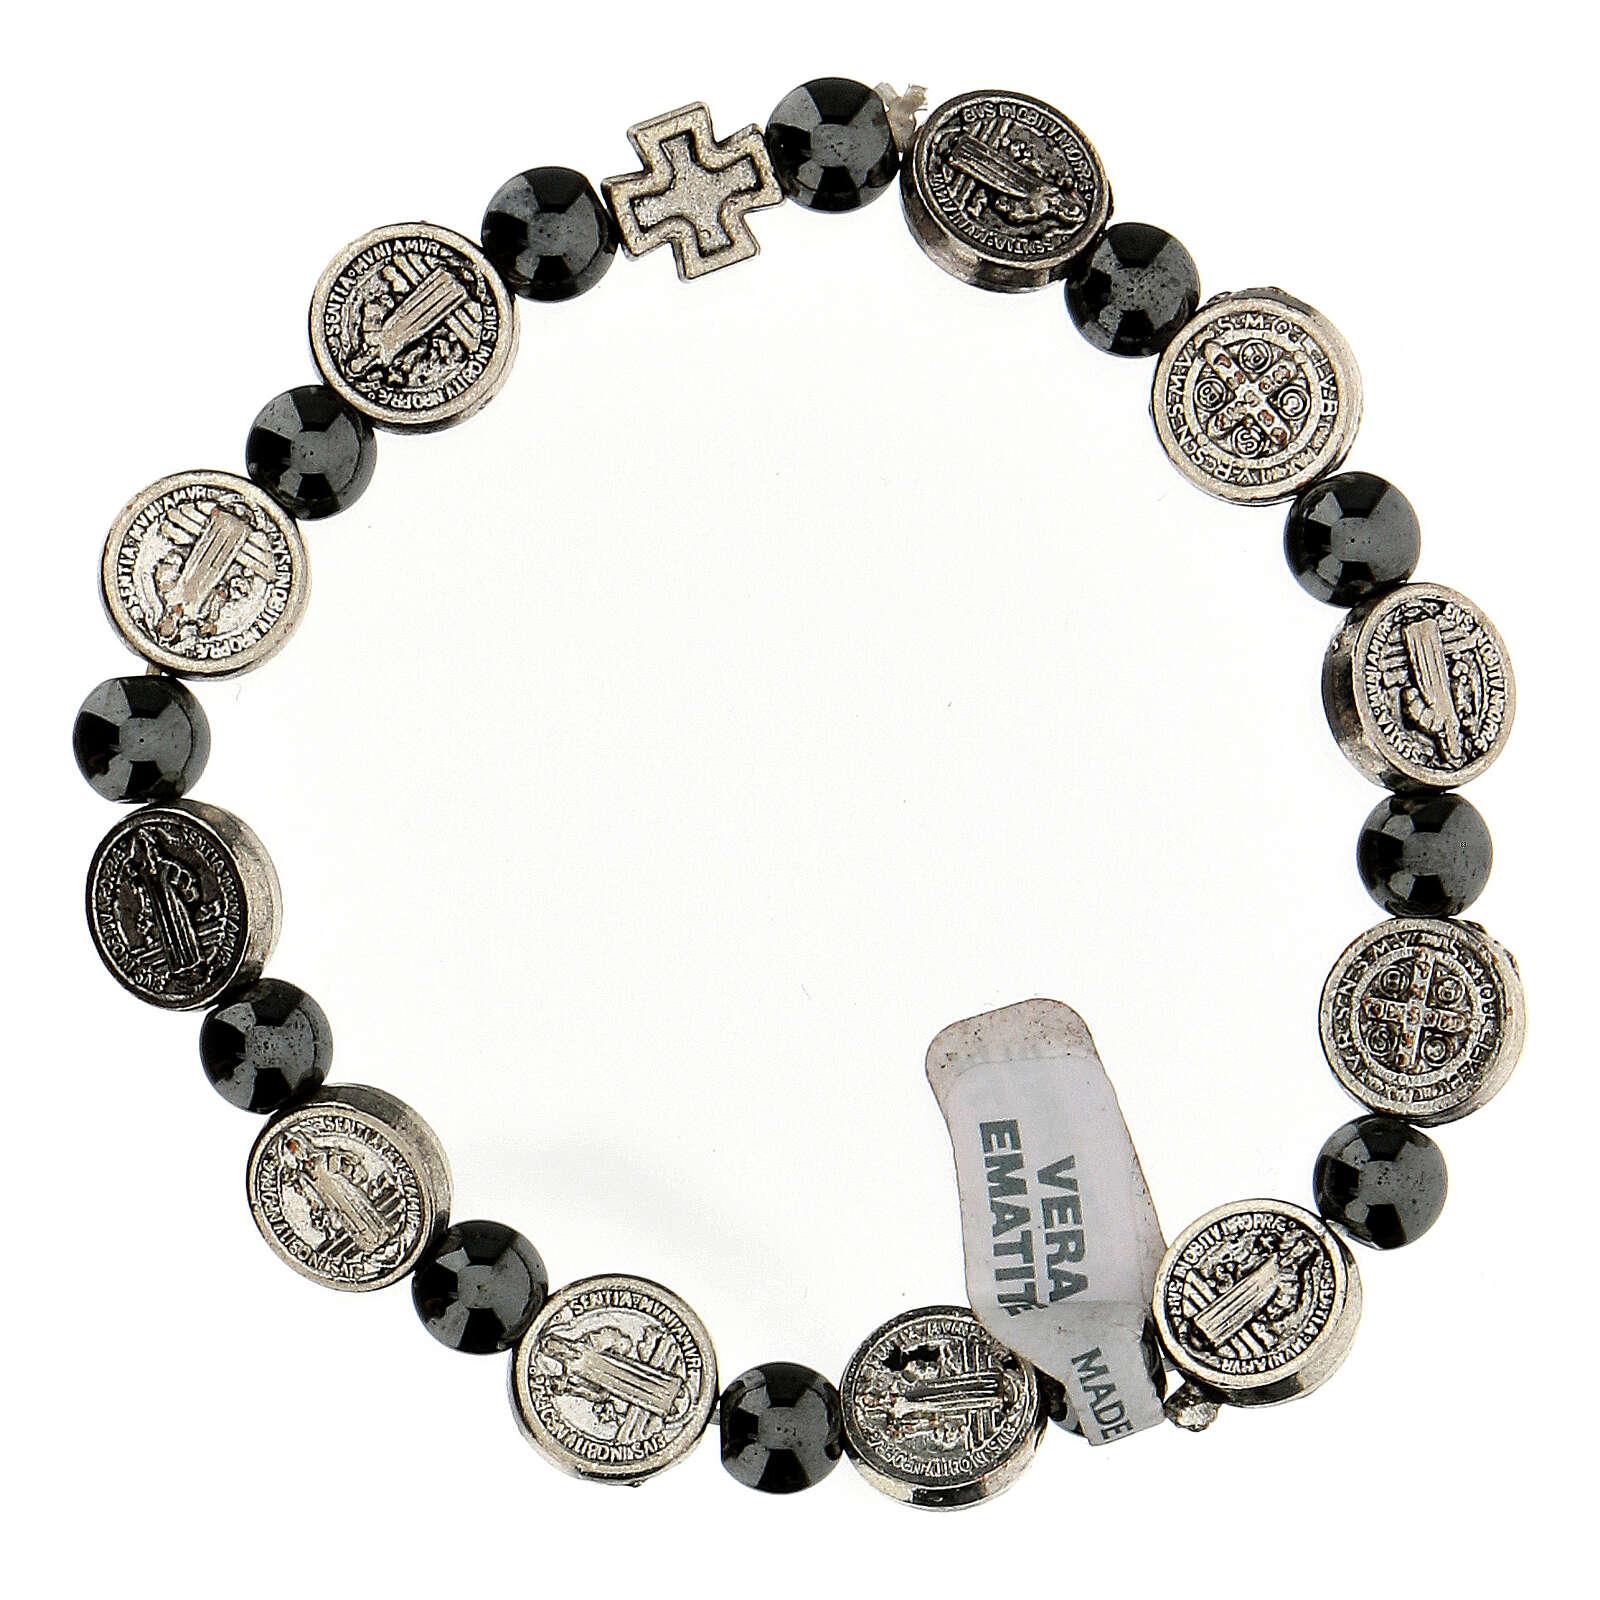 Bracelet dizainier en hématite 7 mm avec médailles en zamak 4